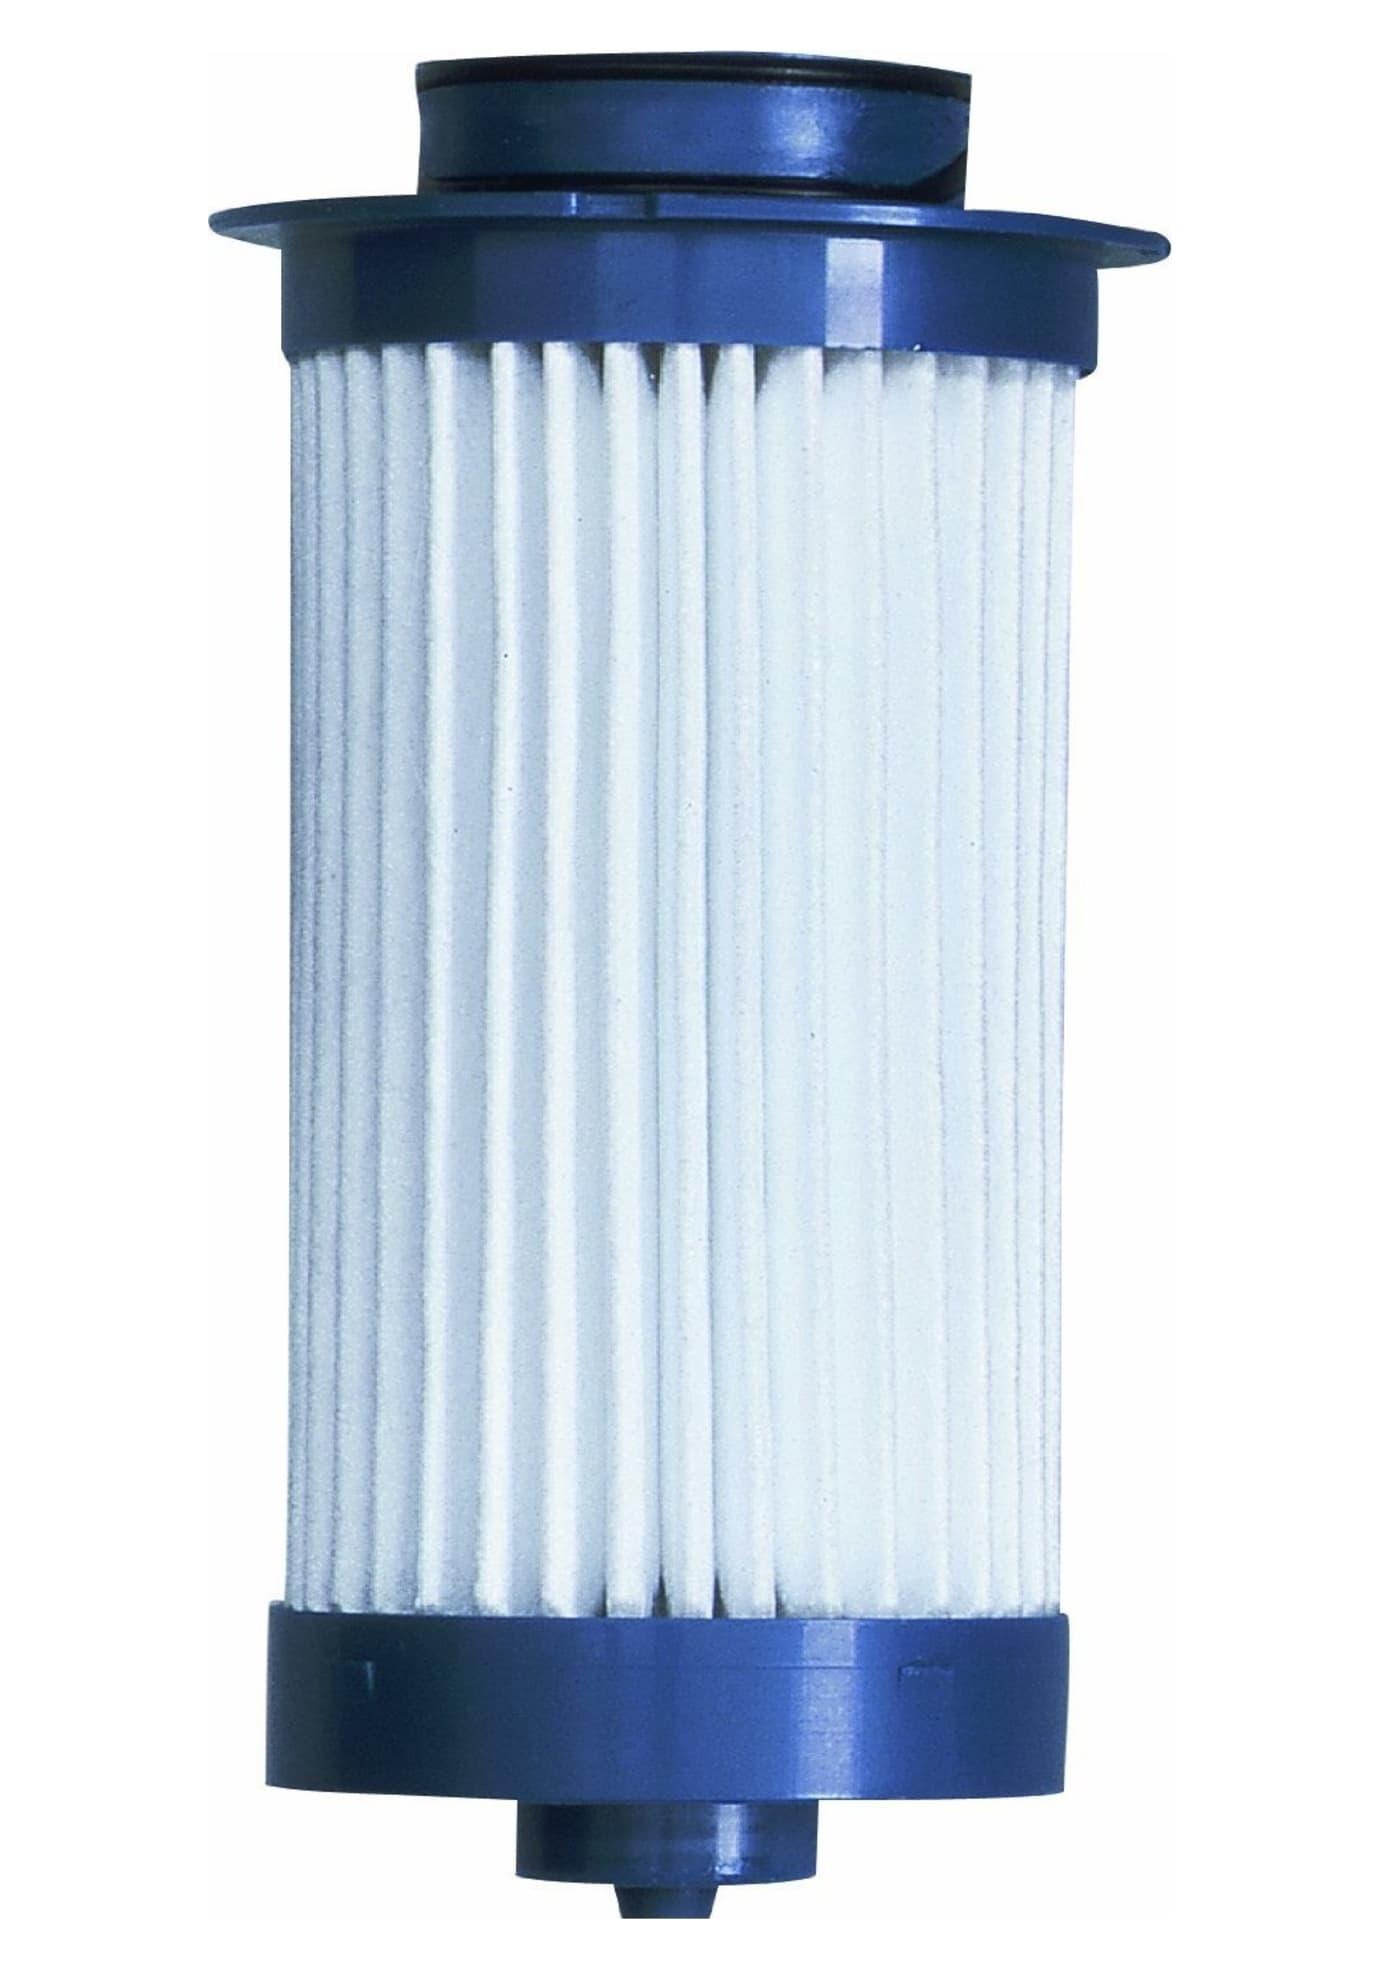 how to clean katadyn vario water filter